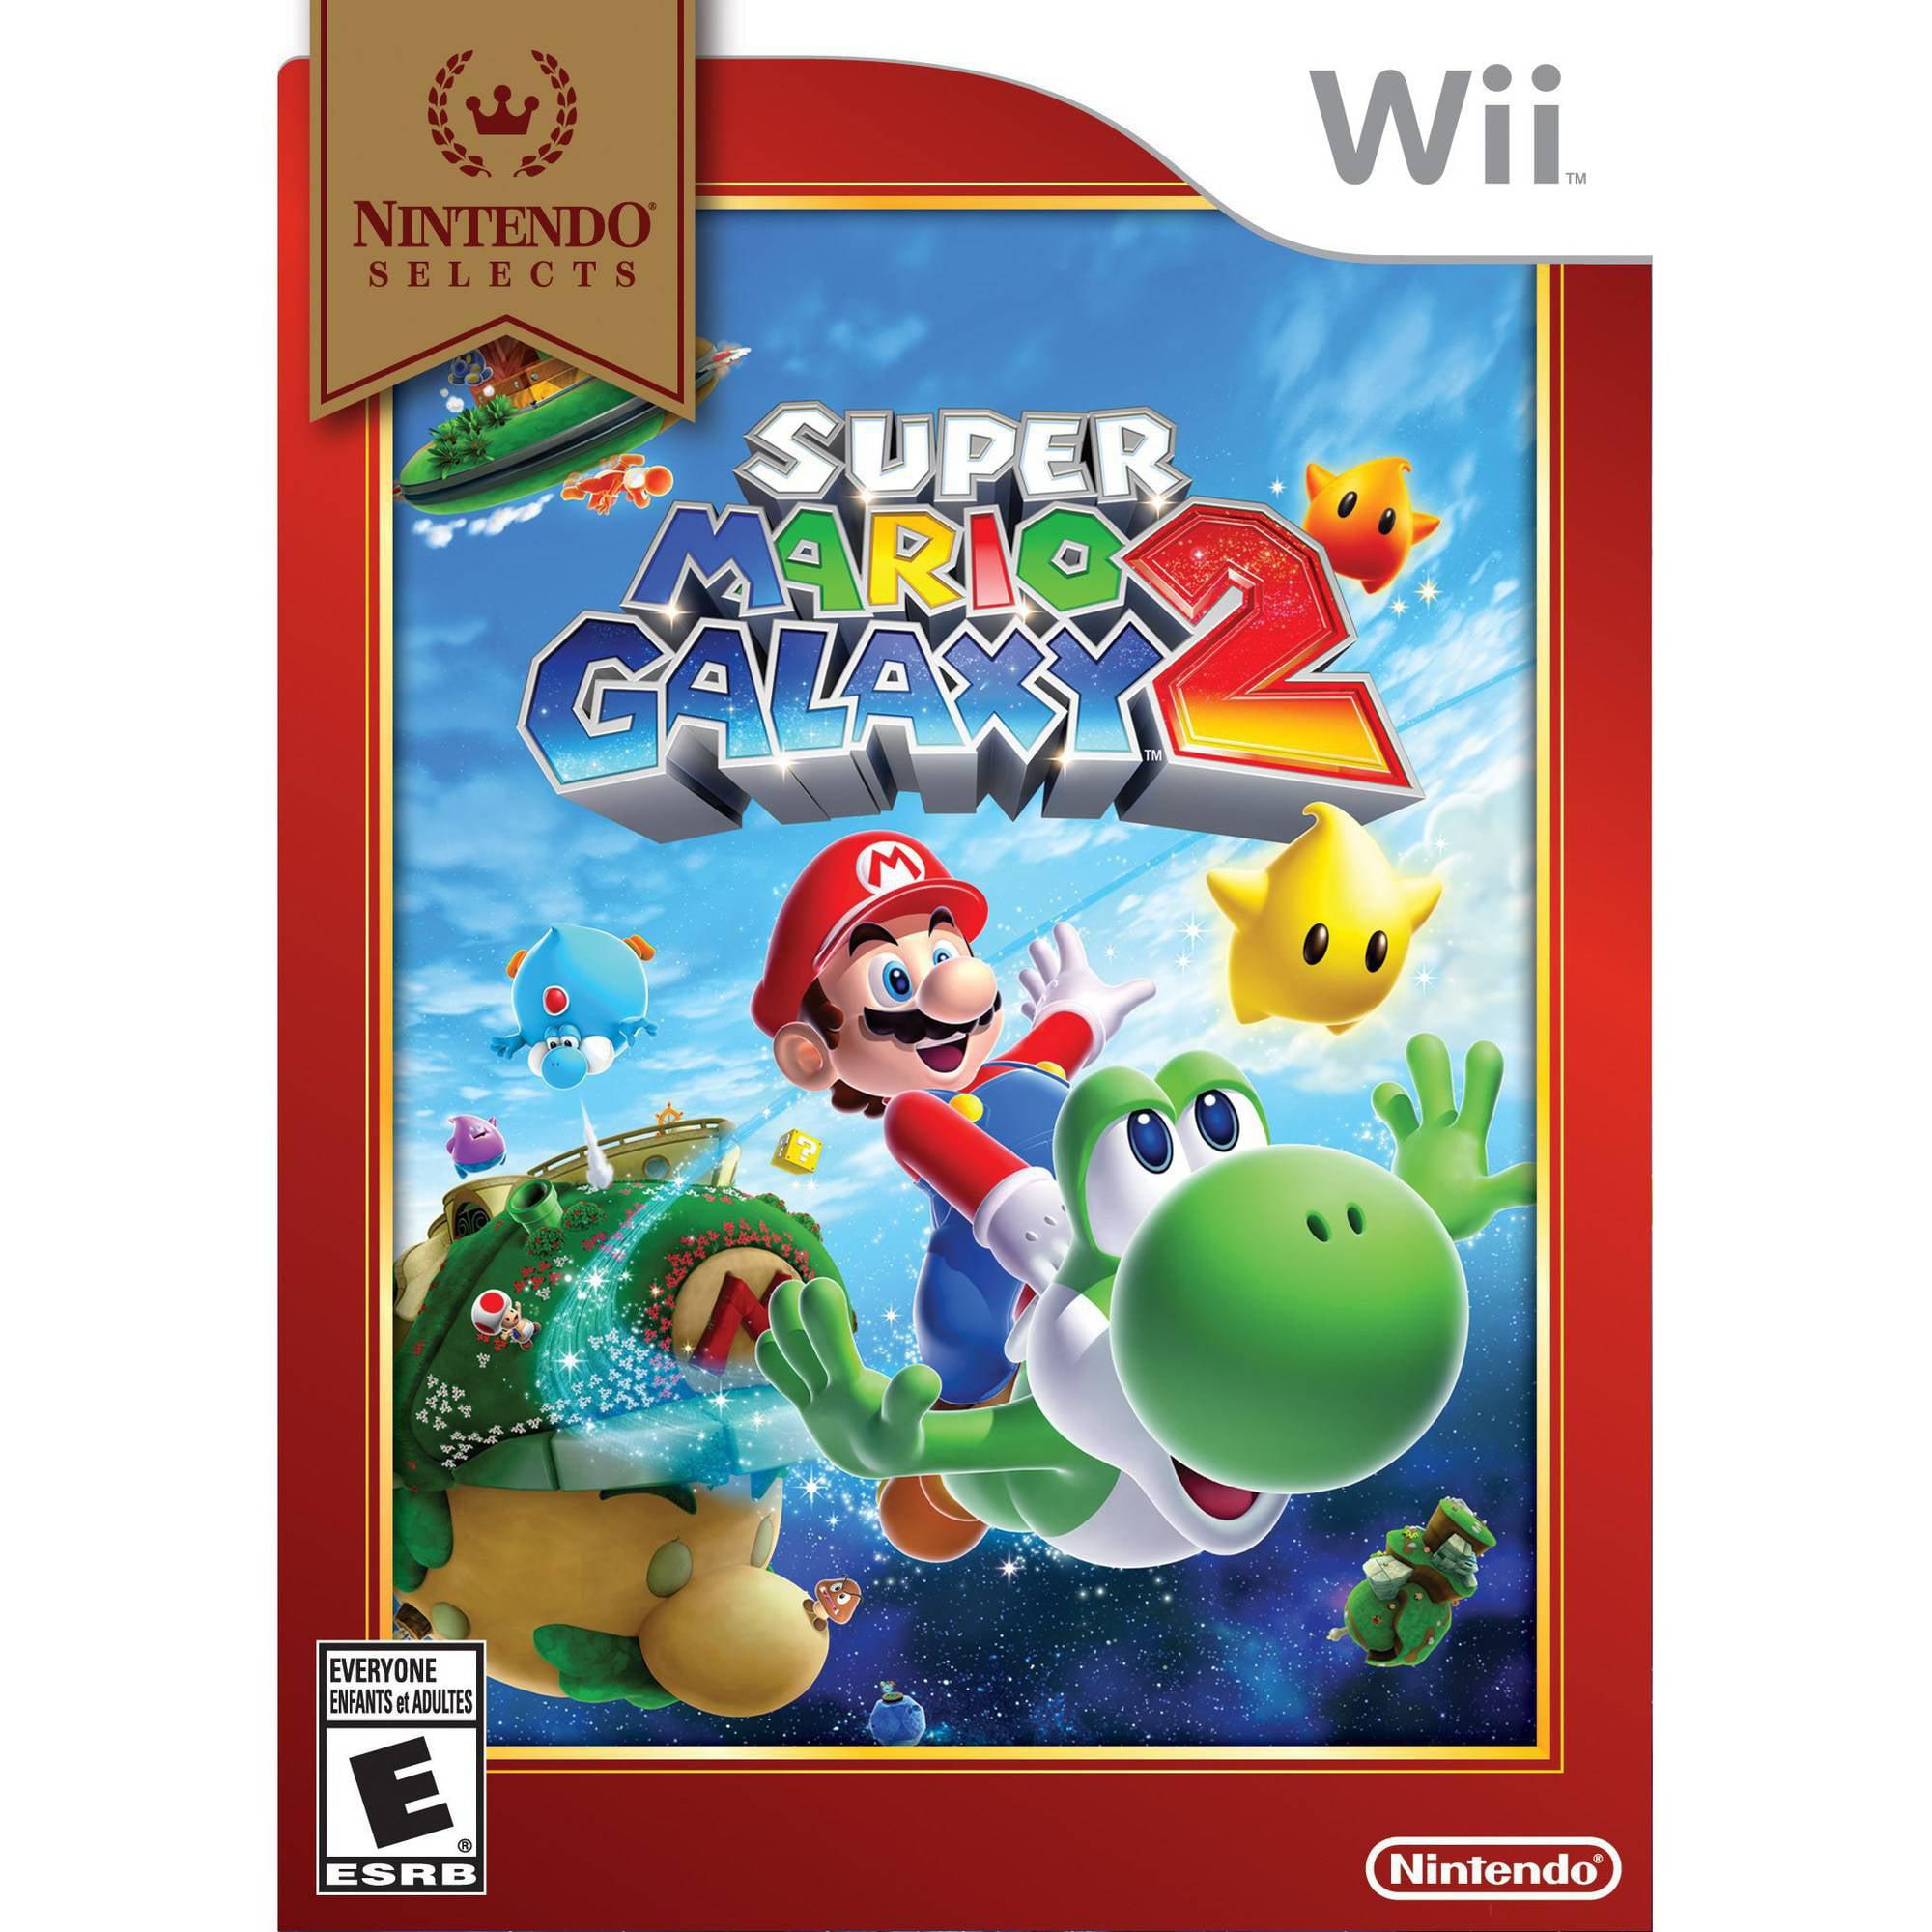 Super Mario Galaxy 2 - Nintendo Selects (Wii U)